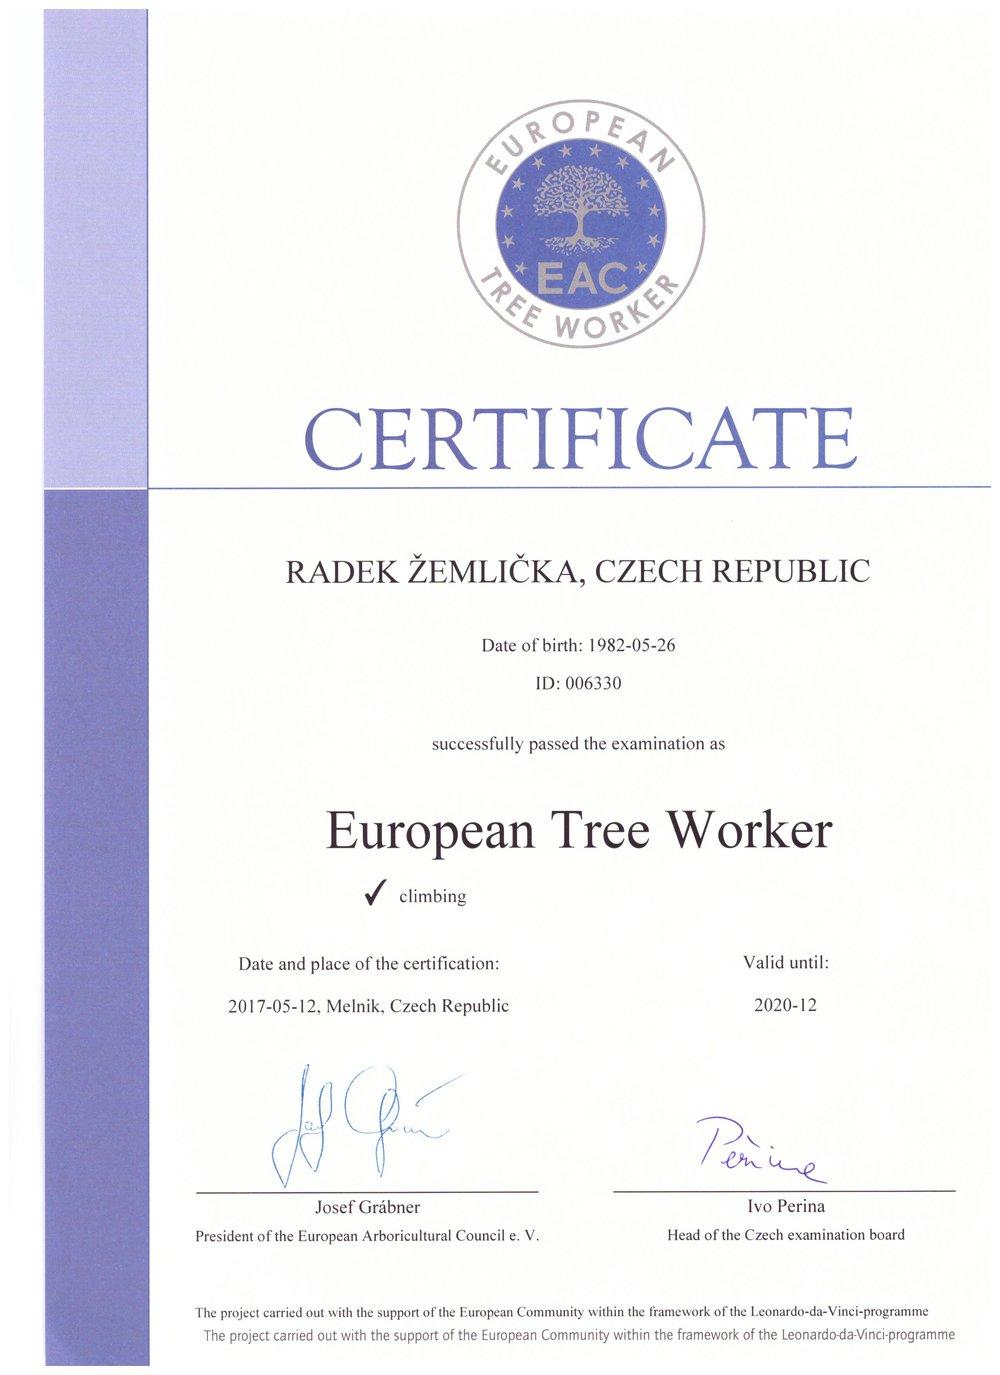 ETW certifikat